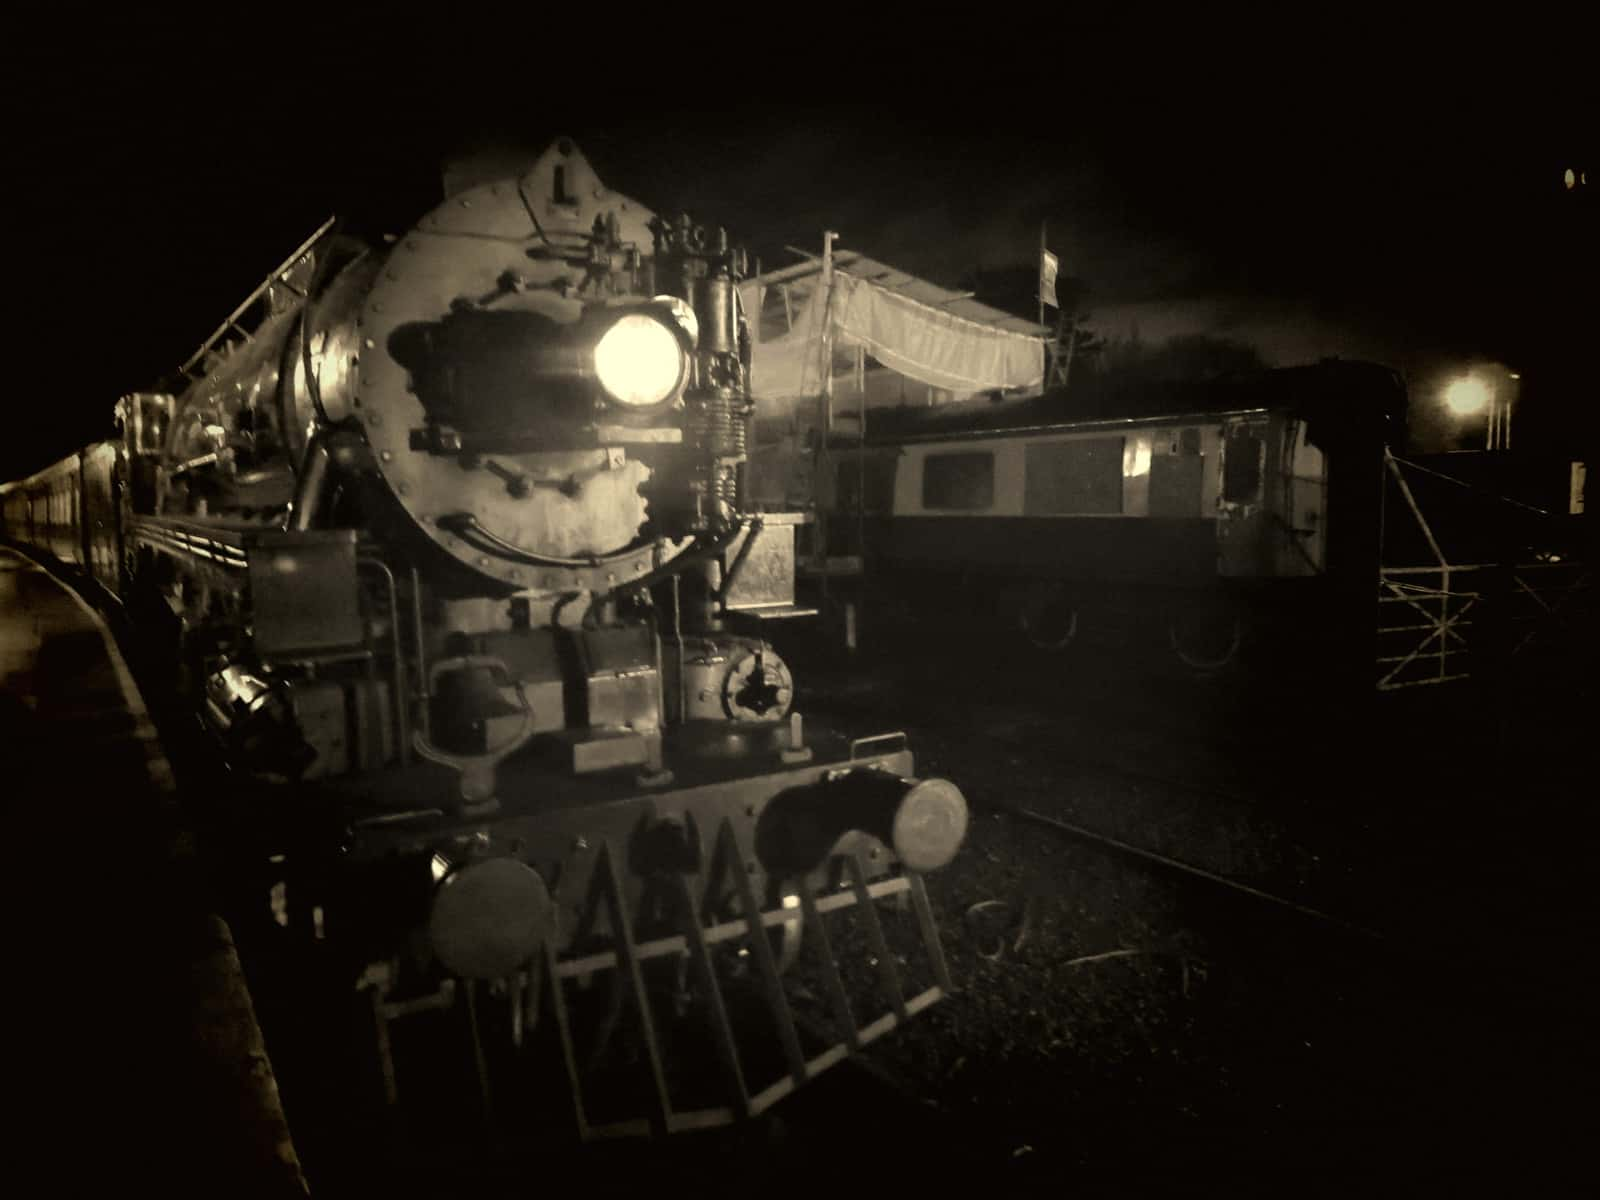 black and white photo of polar express steam engine